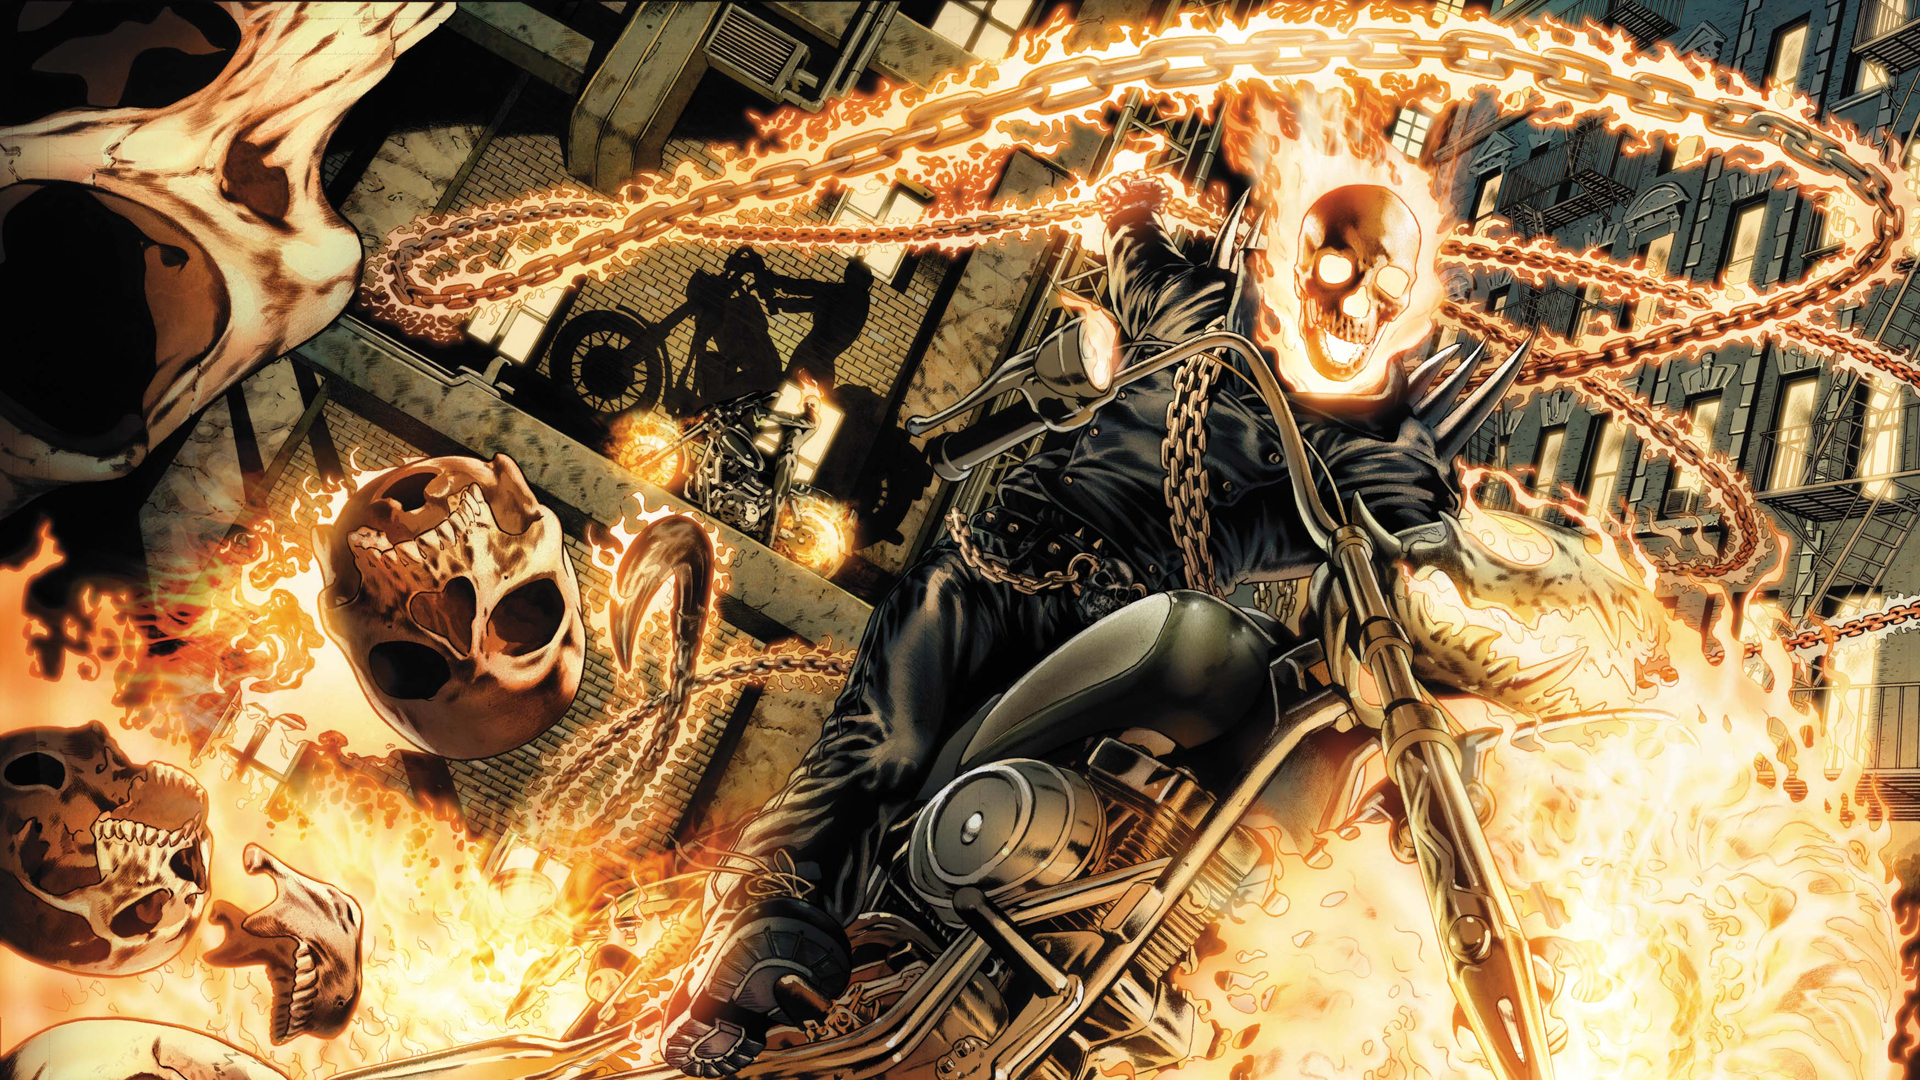 Comics   Ghost Rider Wallpaper 1920x1080